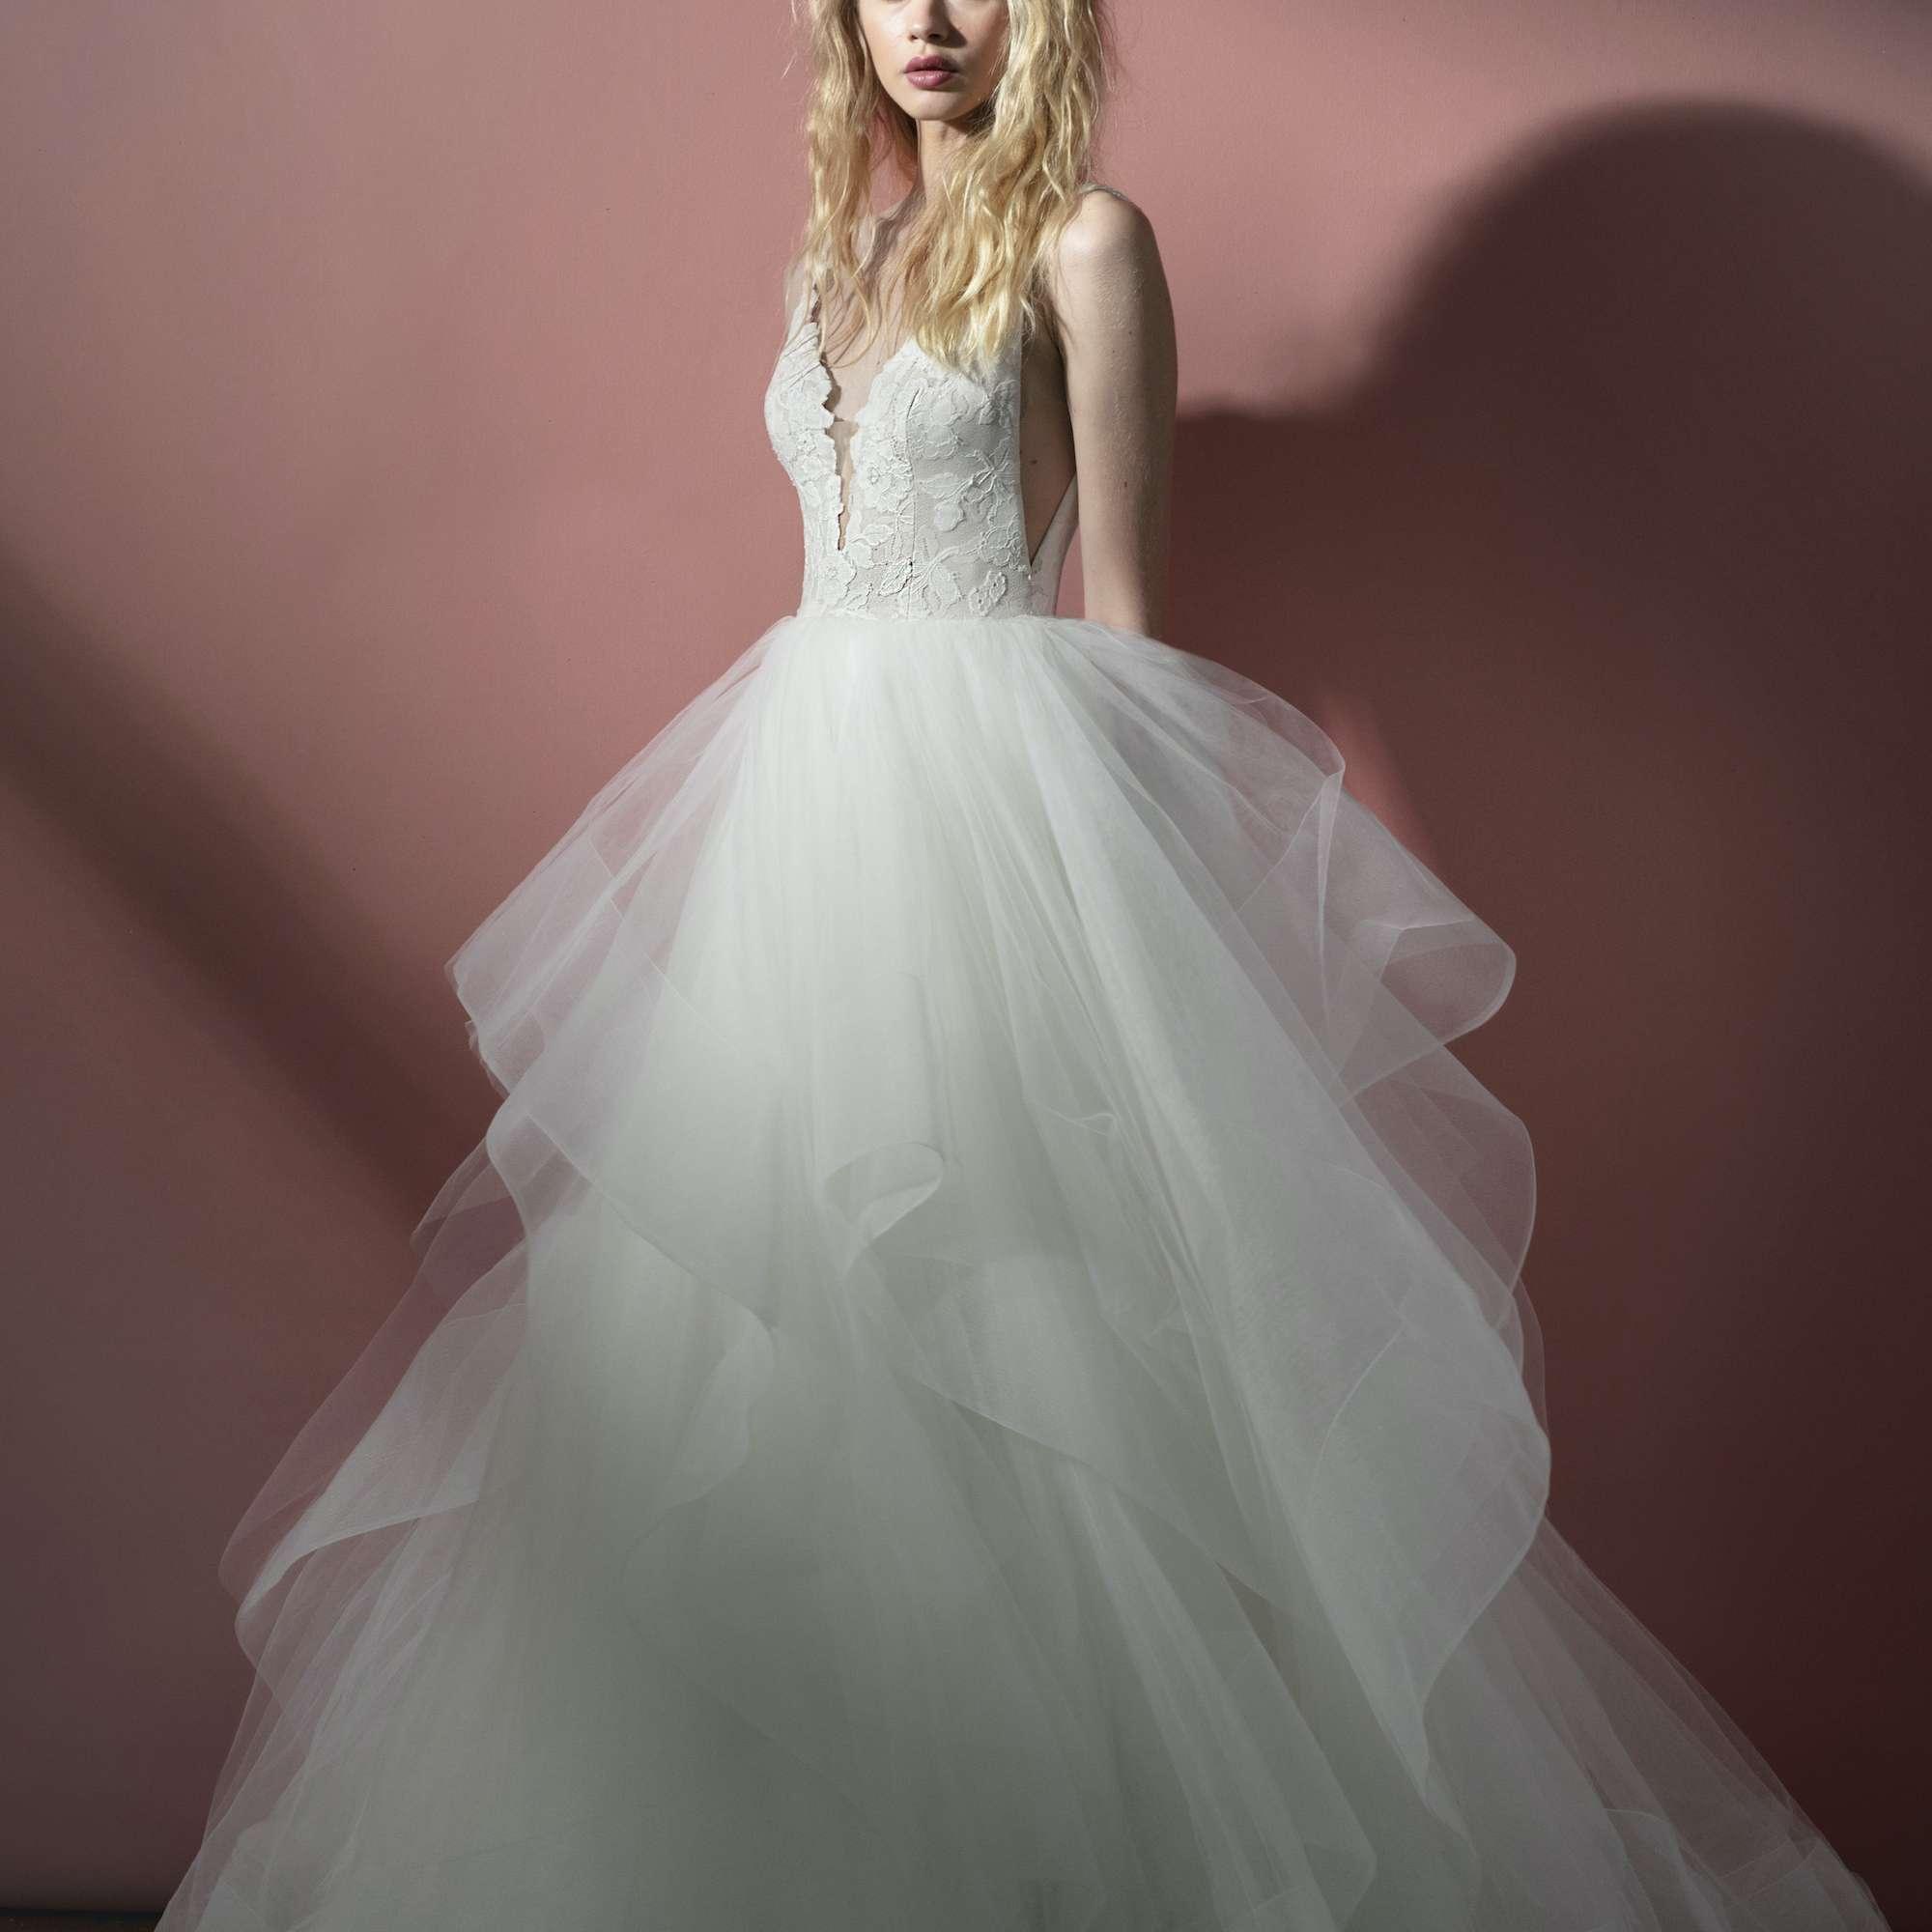 Gilly cascading ruffle wedding dress